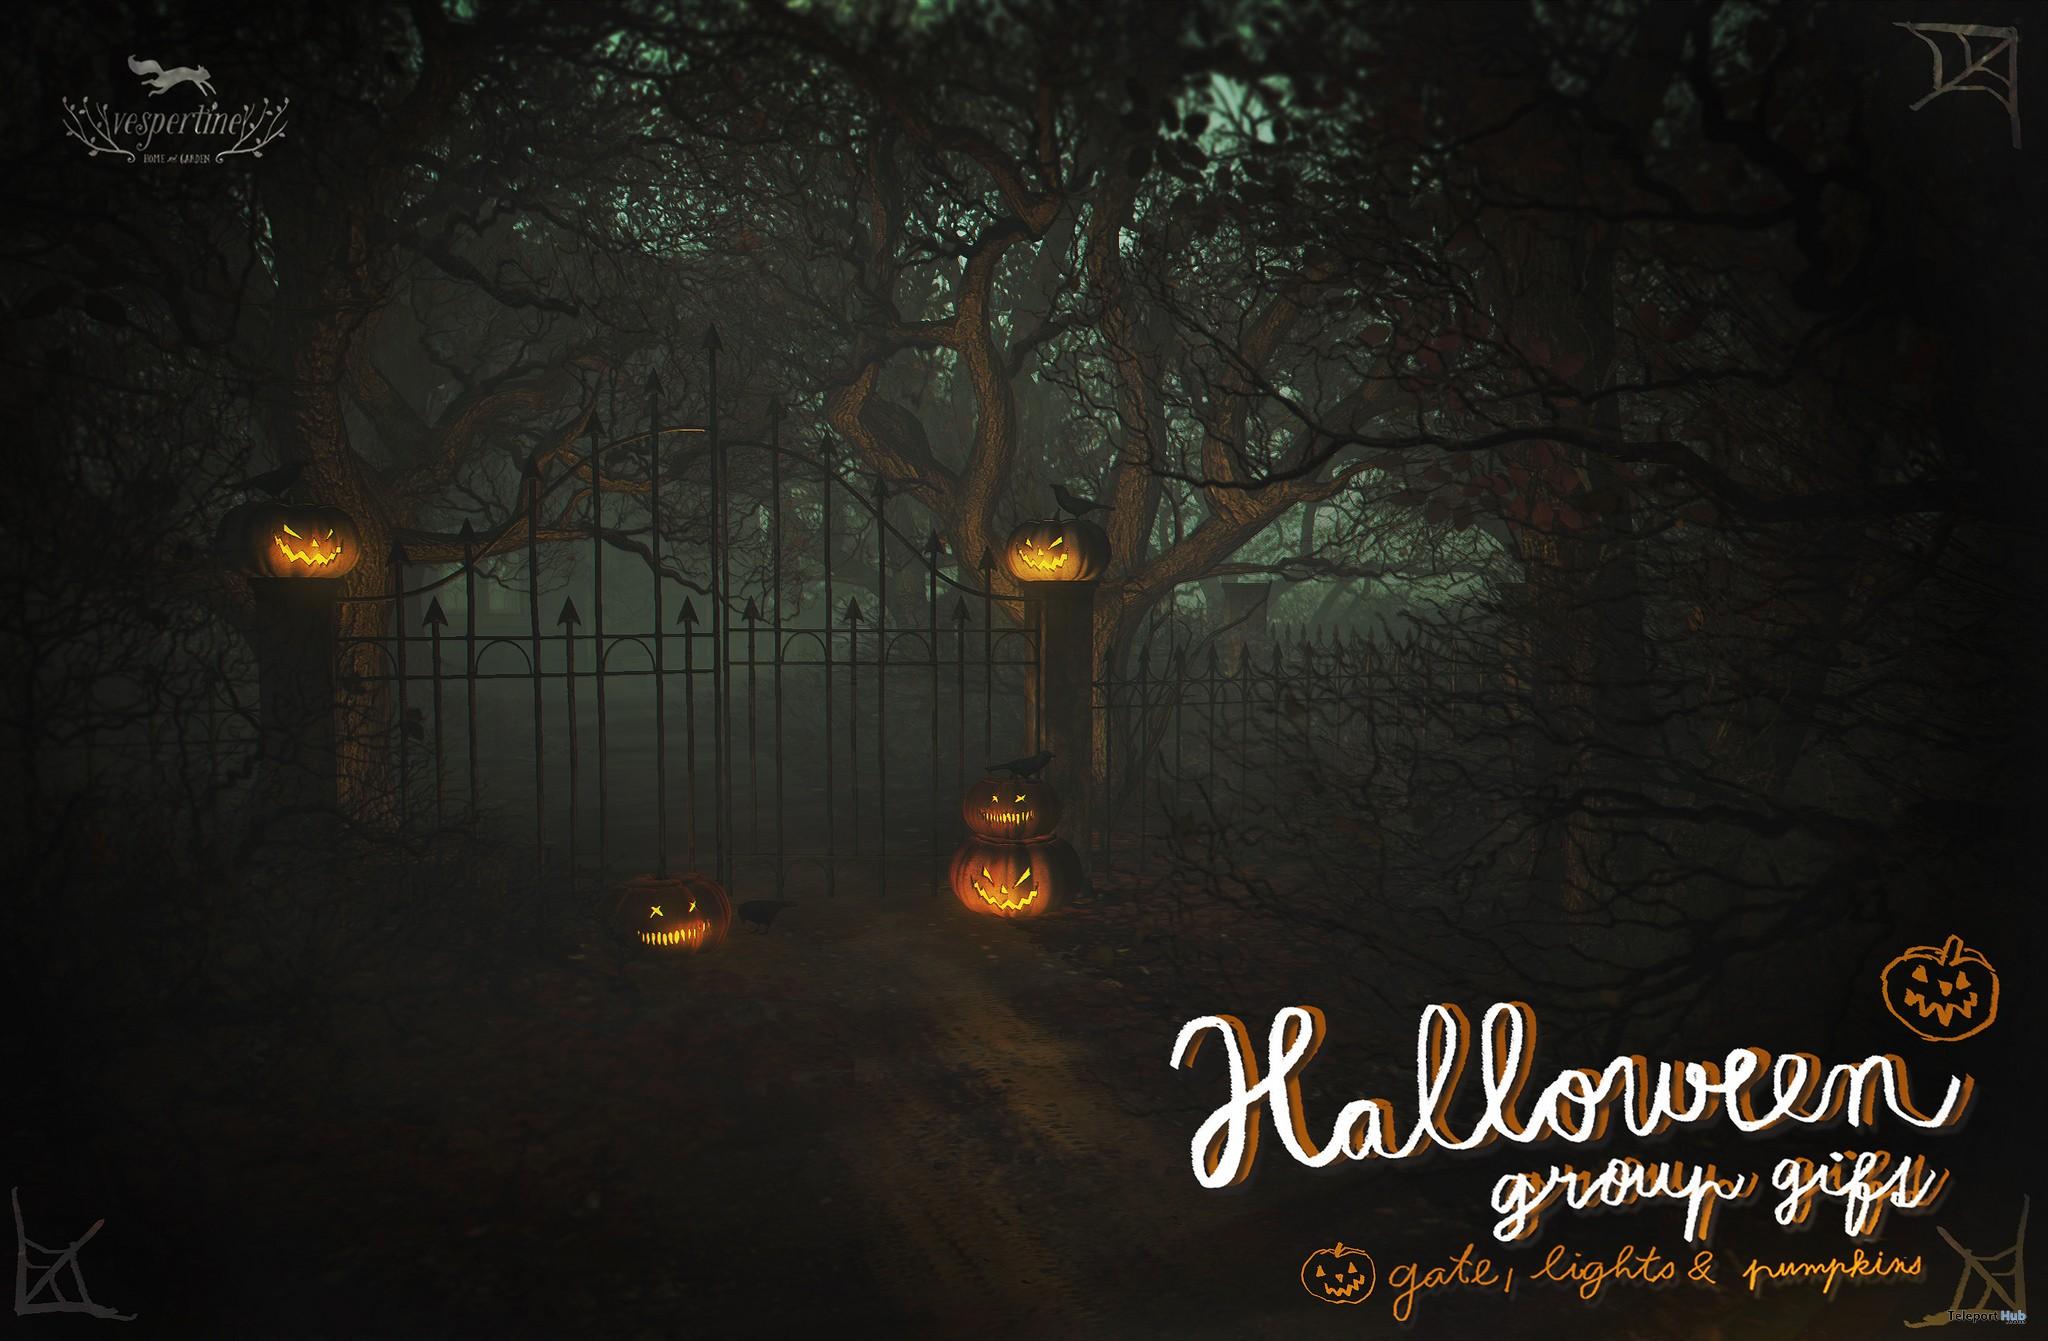 Gate, Lights, and Pumpkins Group Gift by vespertine - Teleport Hub - teleporthub.com